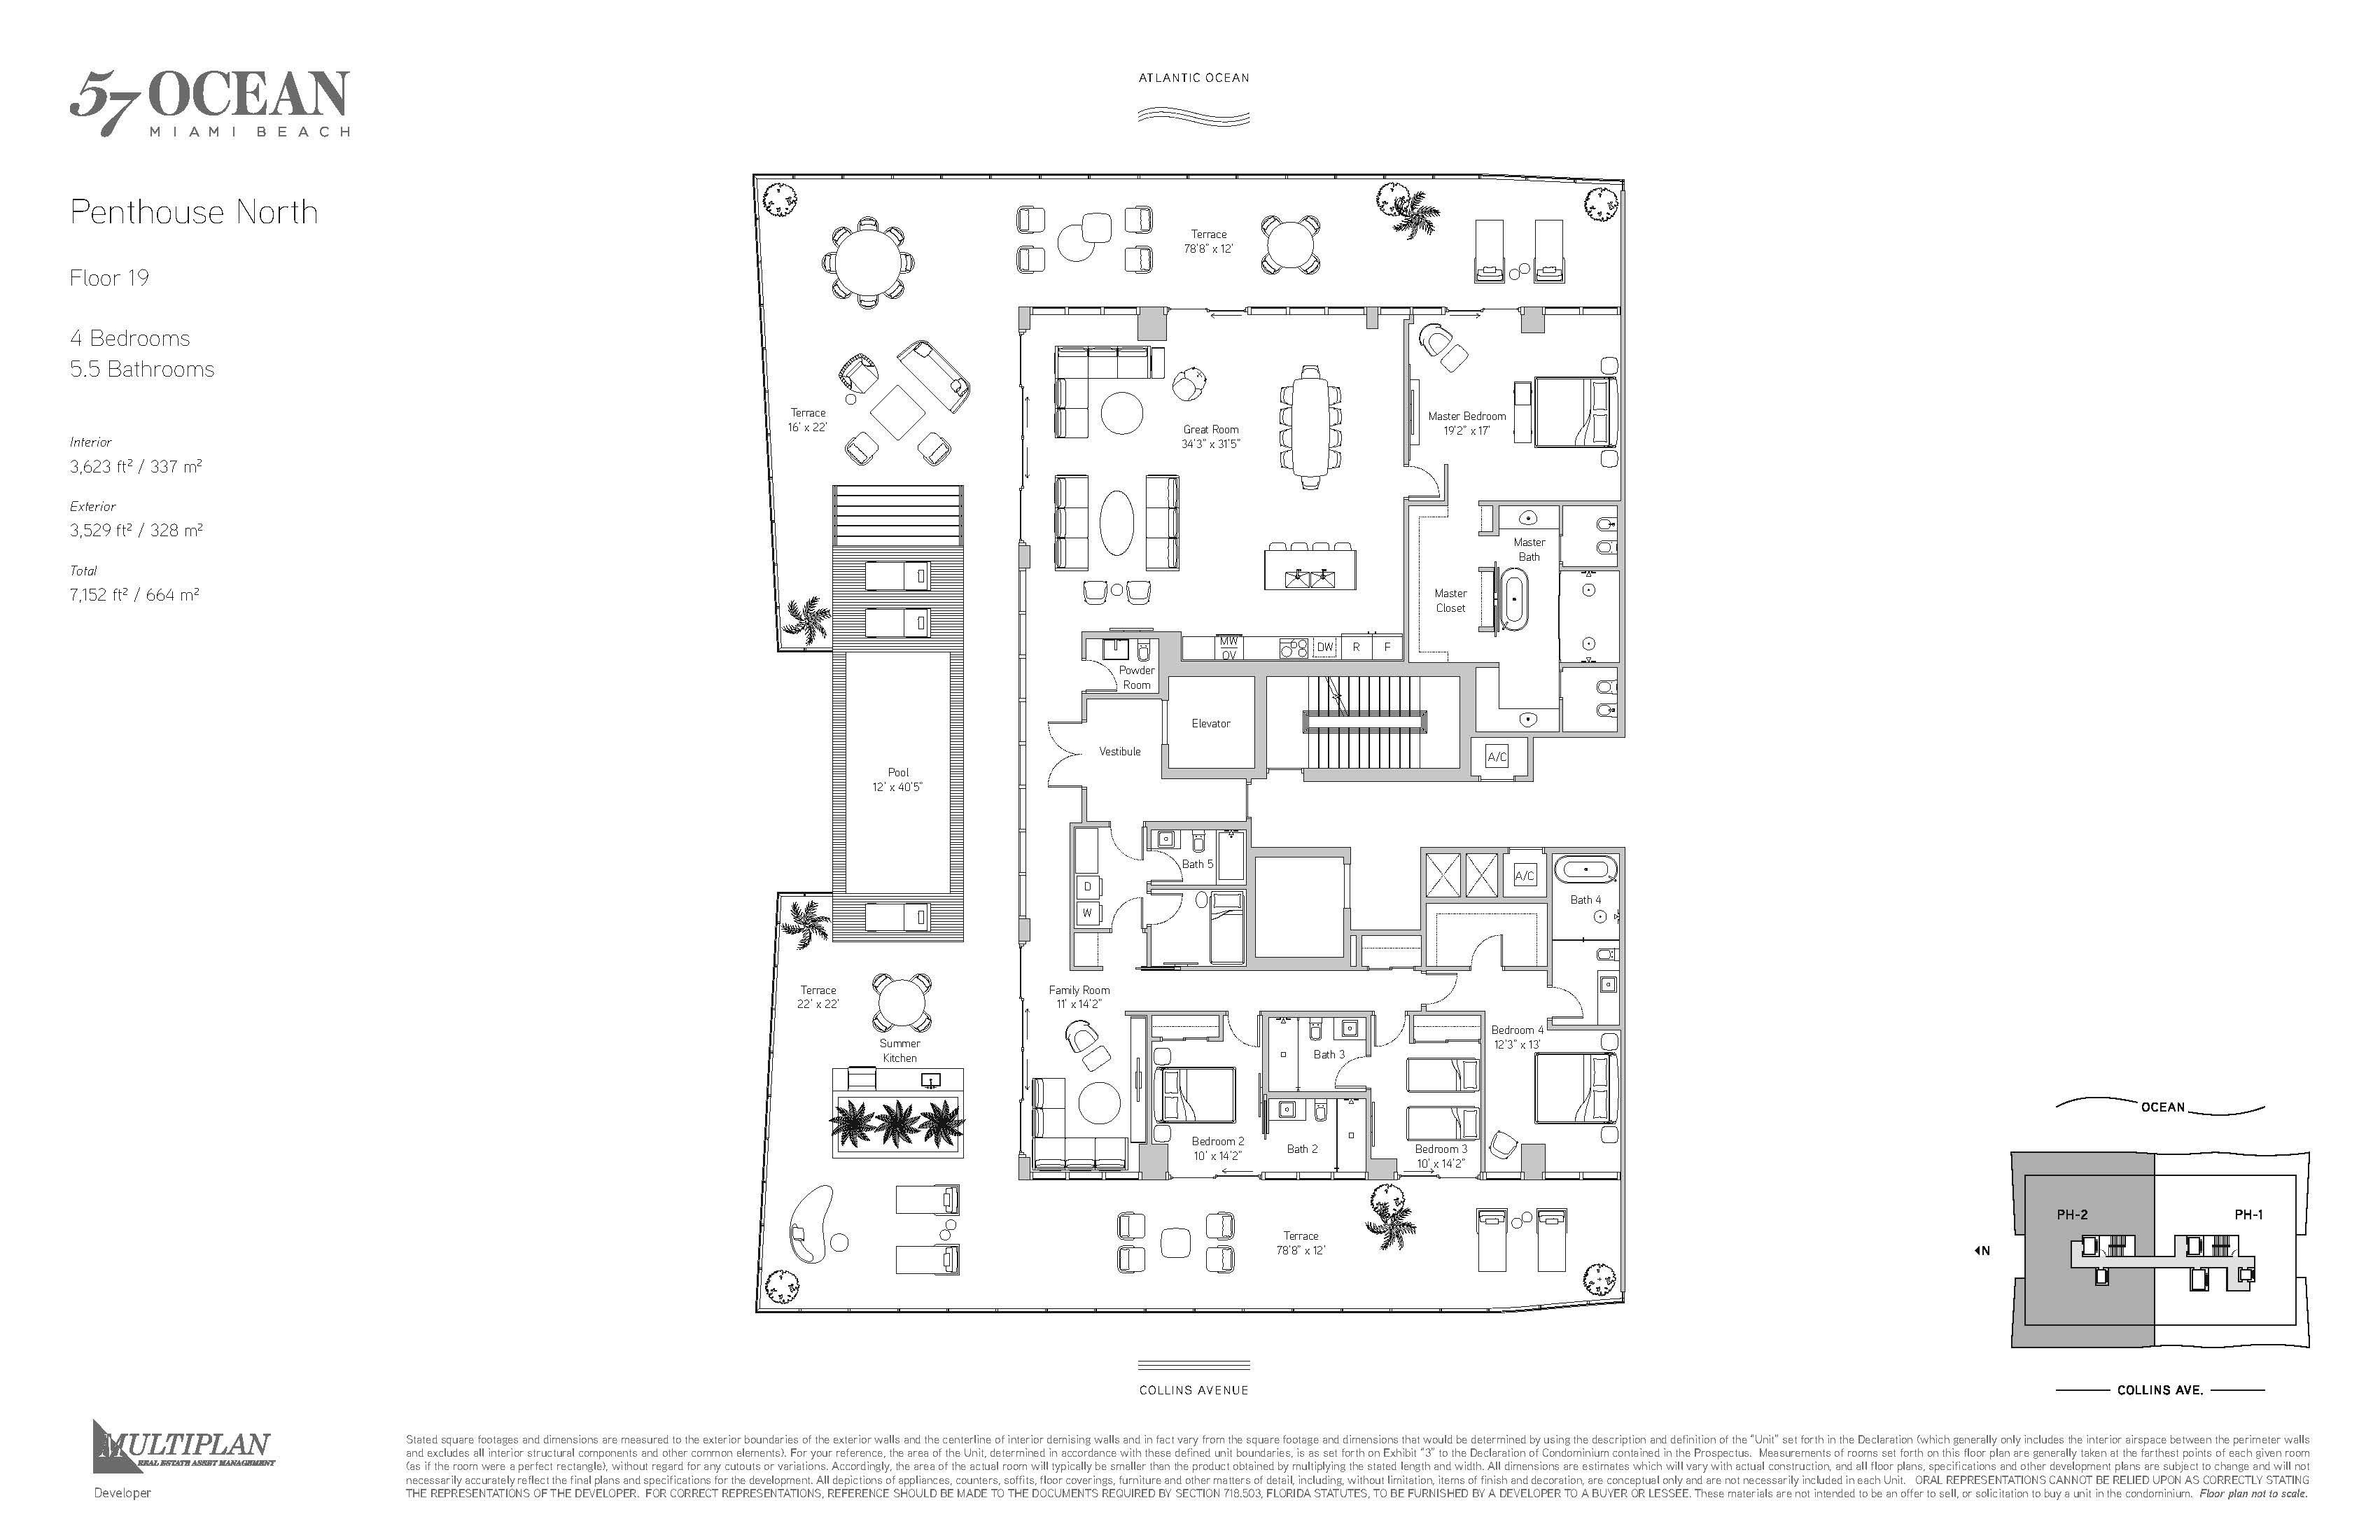 57 Ocean Miami Beach - Floor Plan - Penthouse North